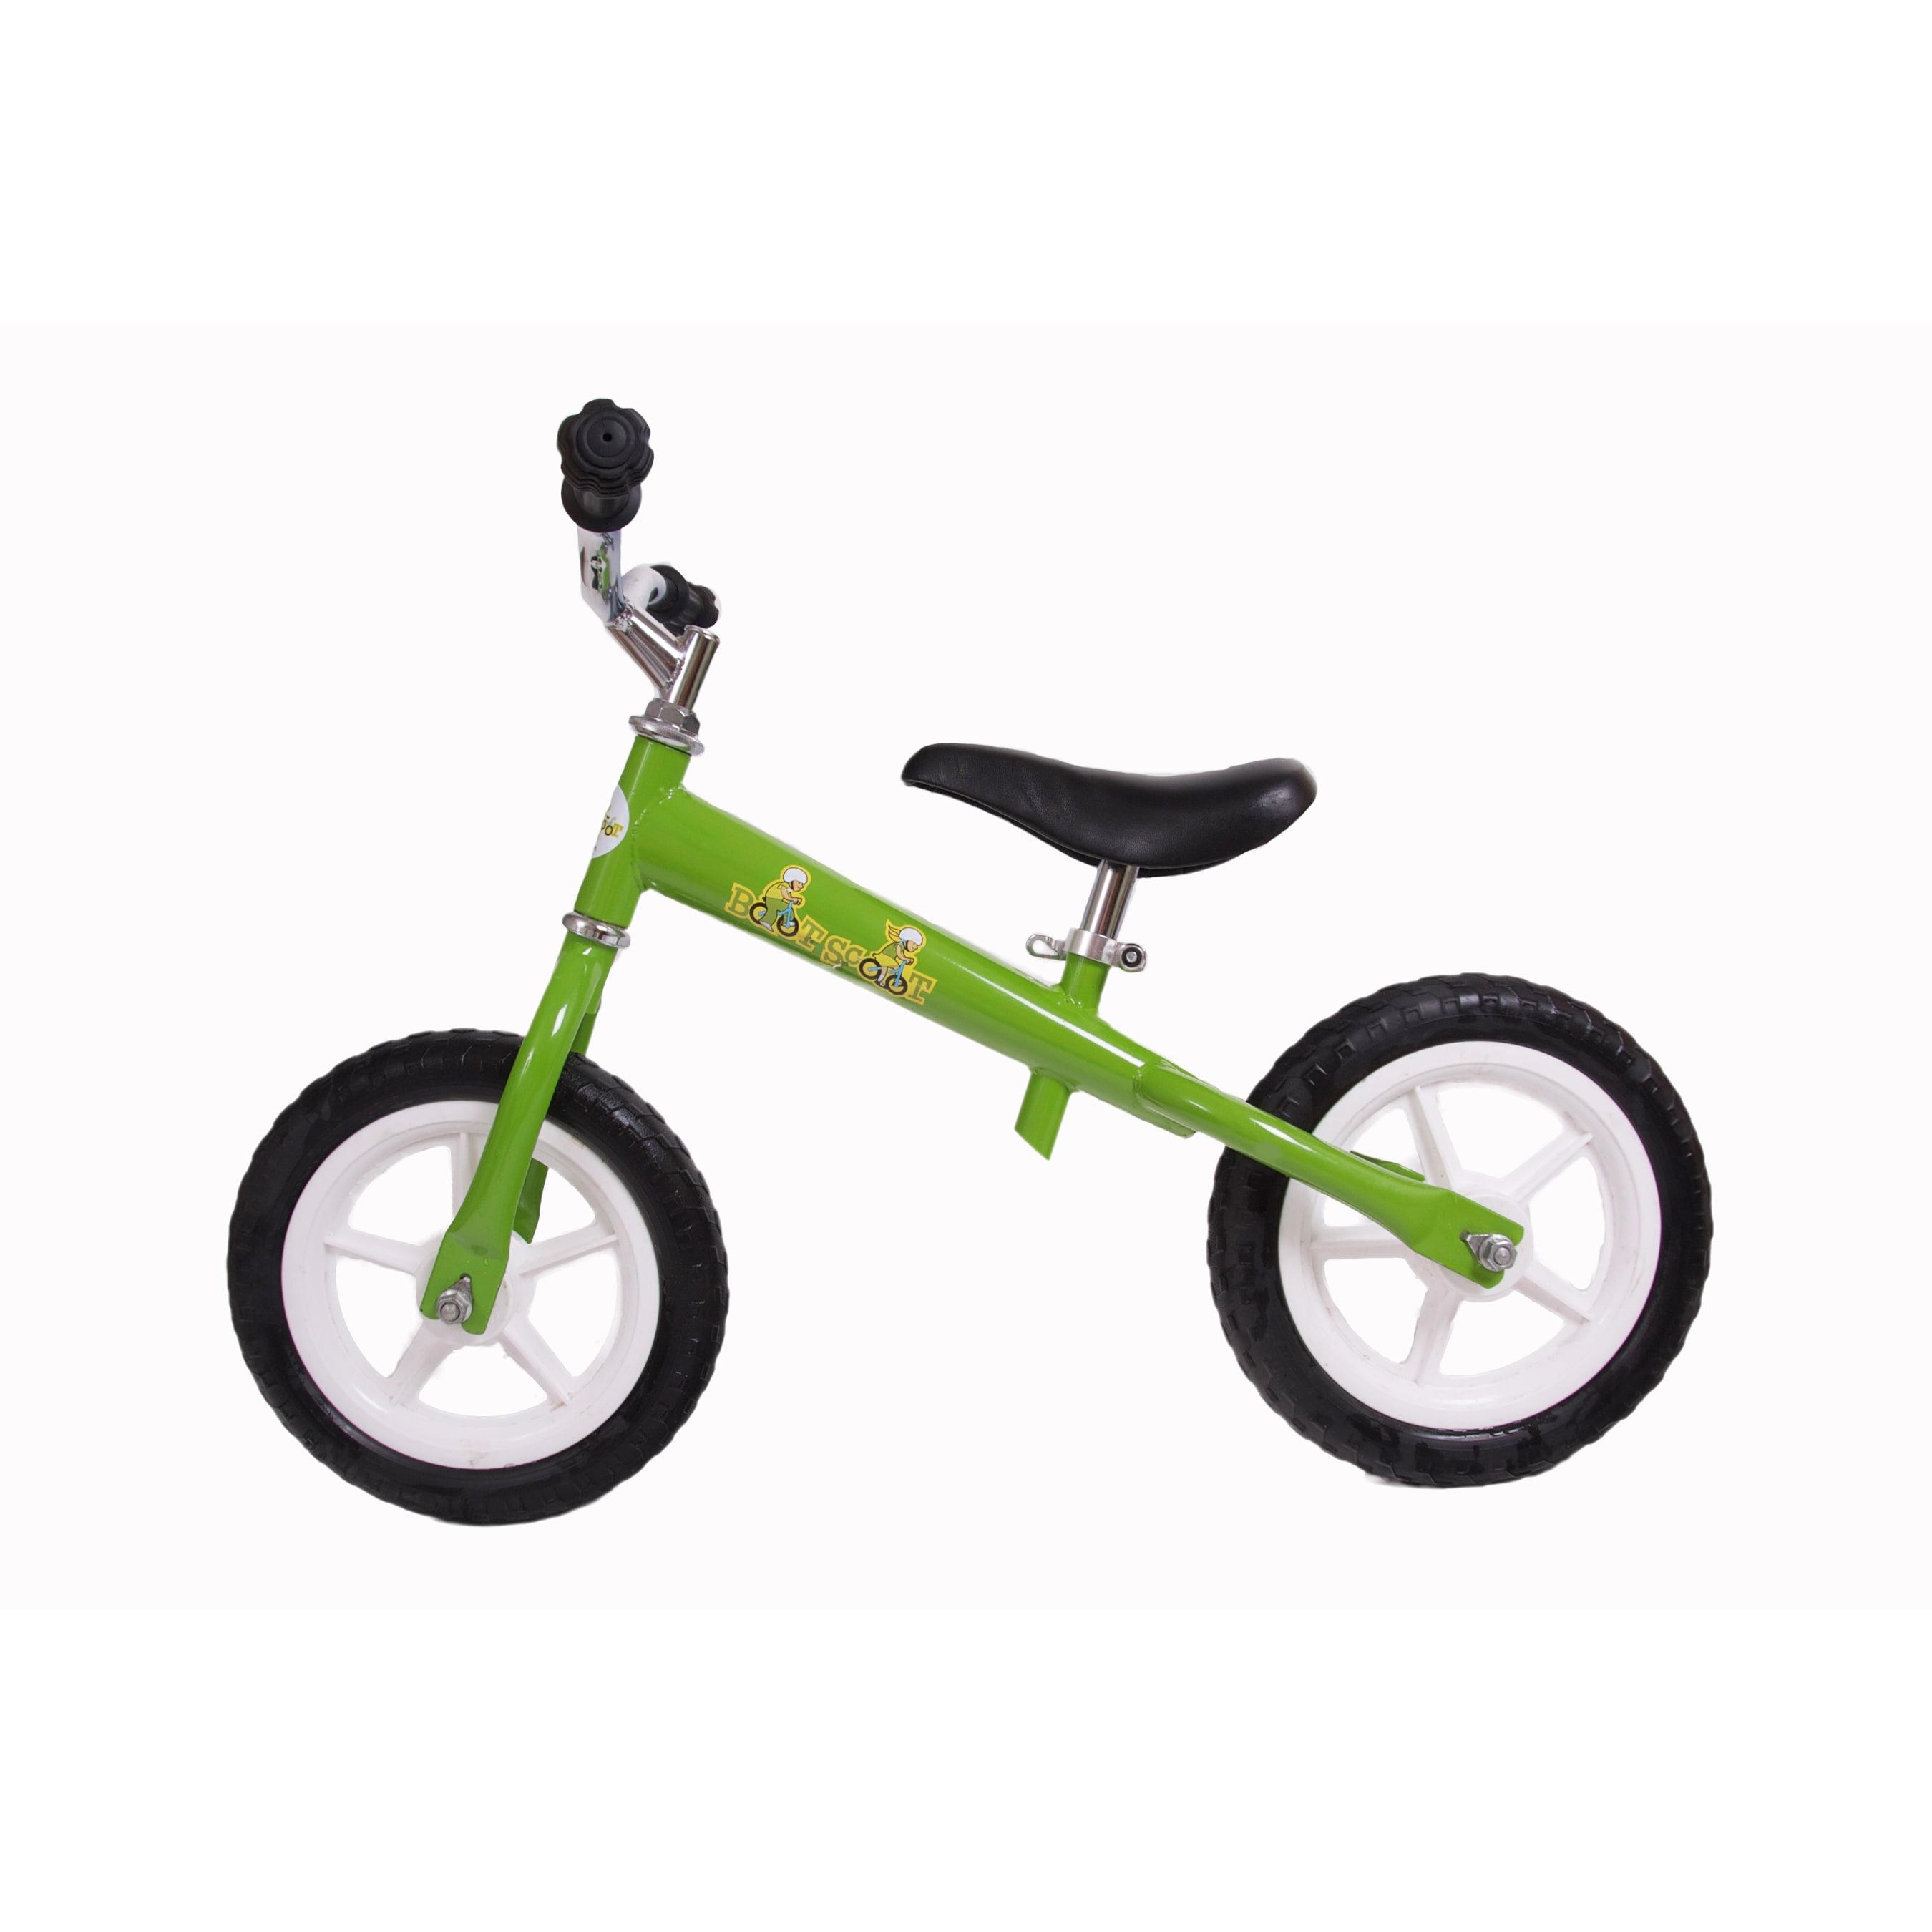 Boot Scoot Bikes Zoomer Balance Bike (Green), Size 12-inch